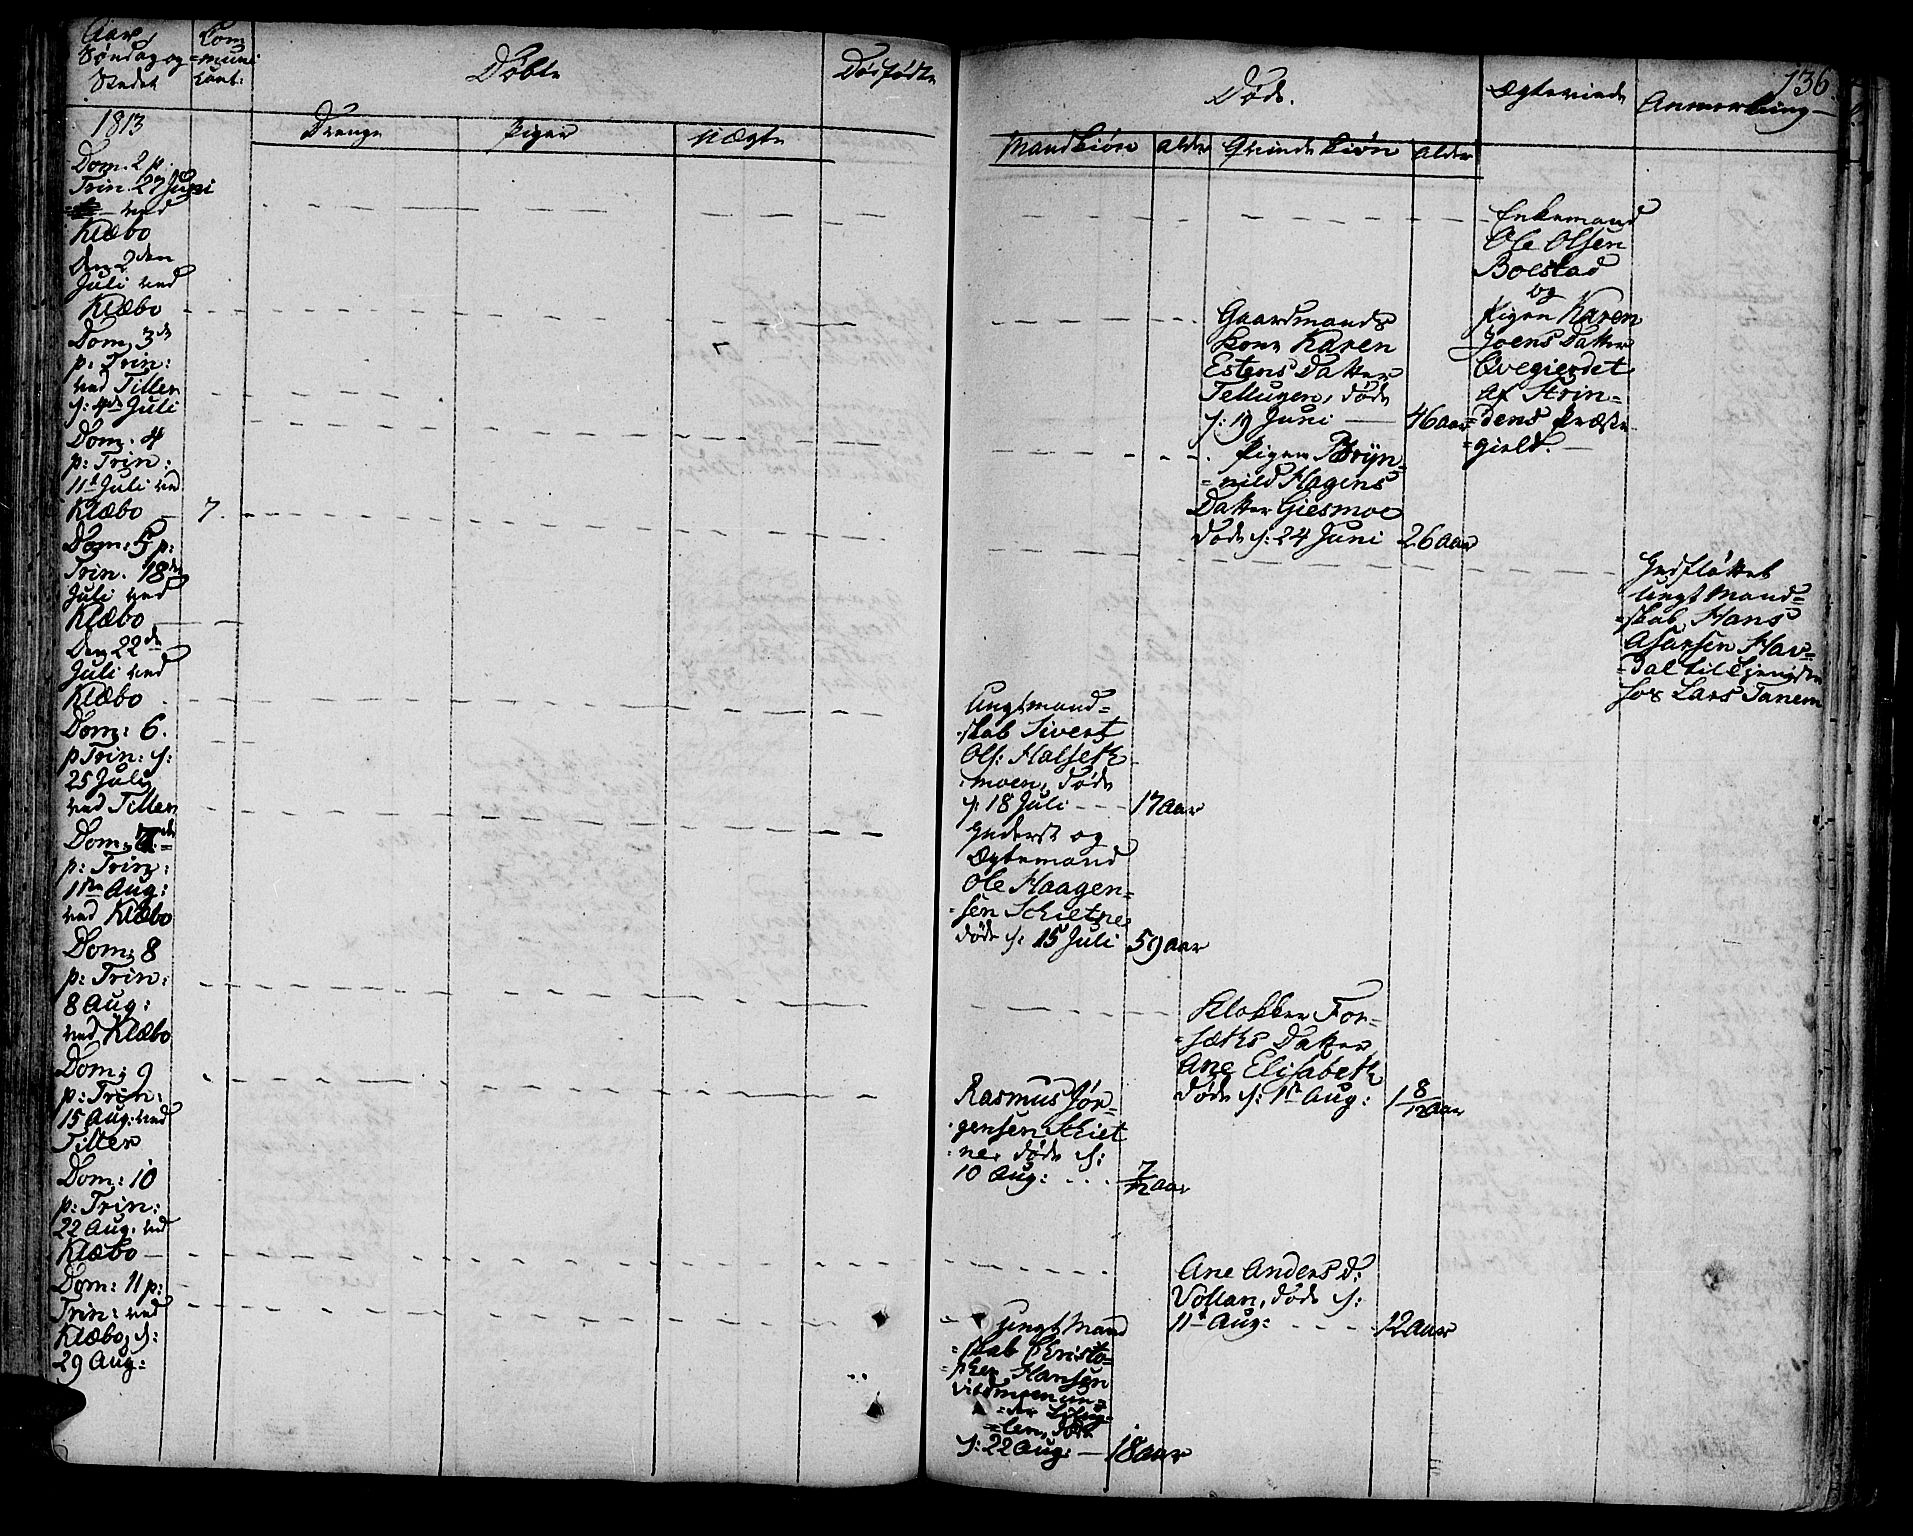 SAT, Ministerialprotokoller, klokkerbøker og fødselsregistre - Sør-Trøndelag, 618/L0438: Parish register (official) no. 618A03, 1783-1815, p. 136